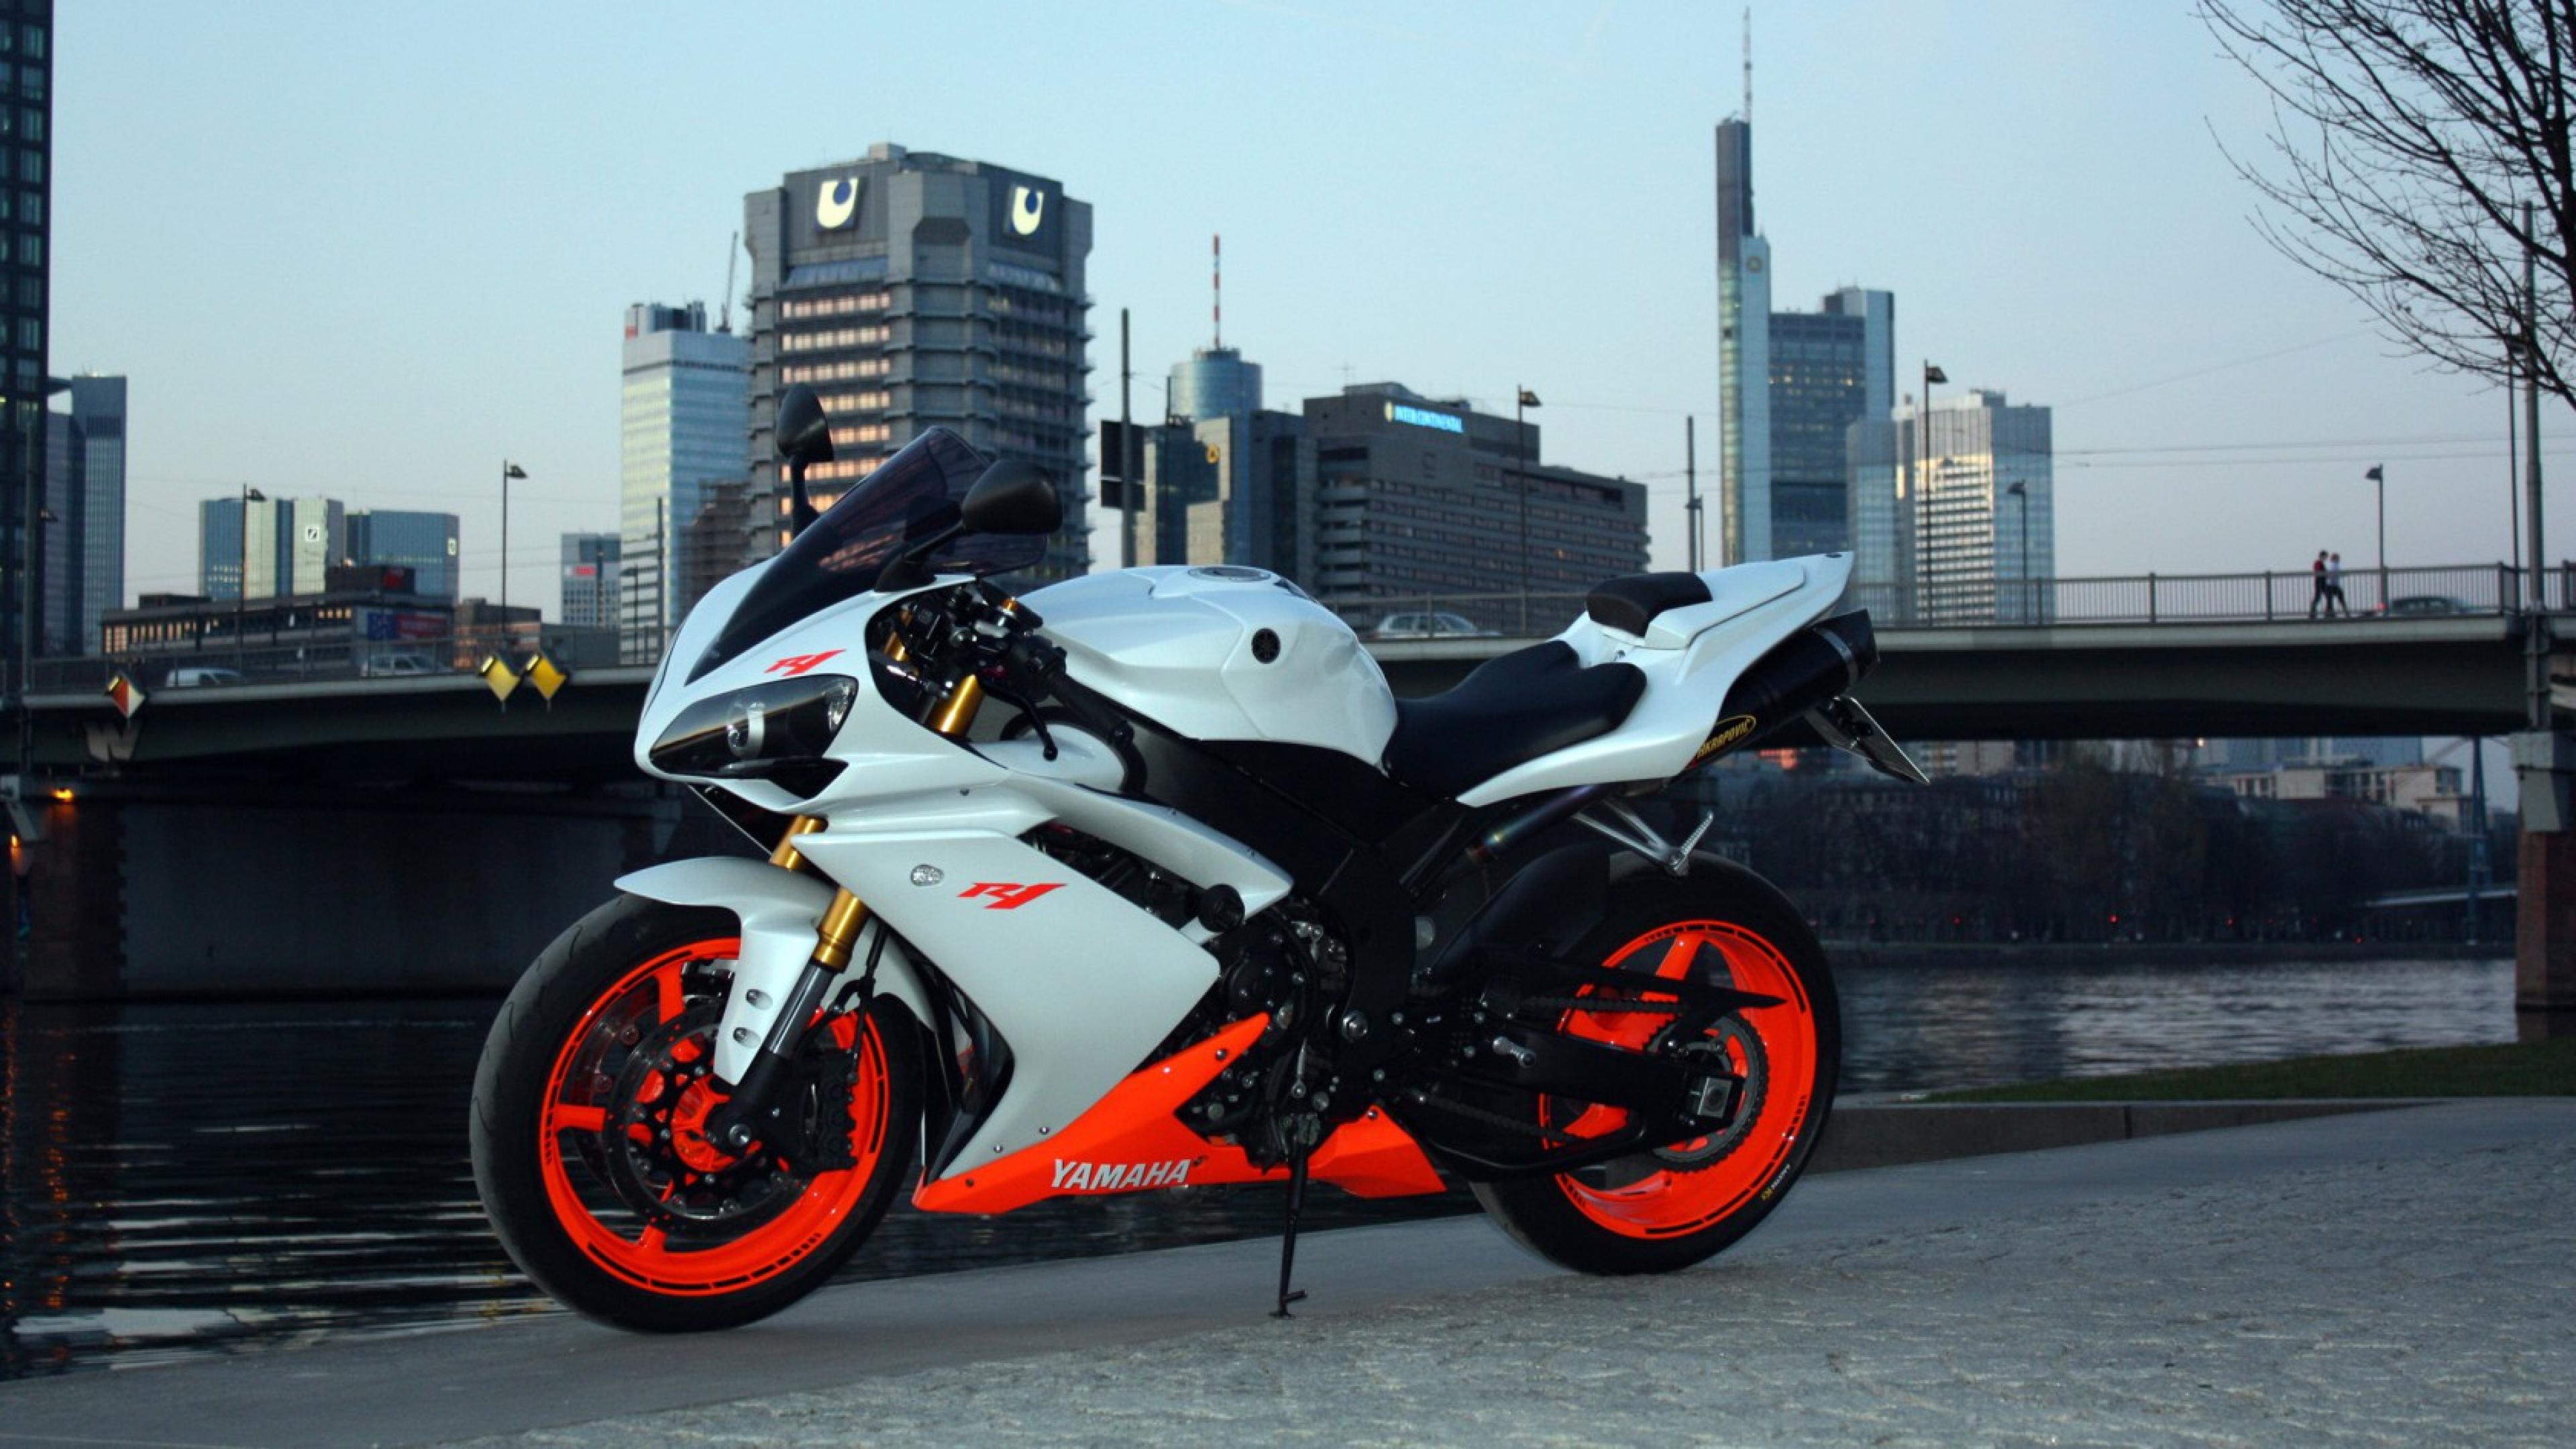 Мотоциклист Yamaha на вираже подборки